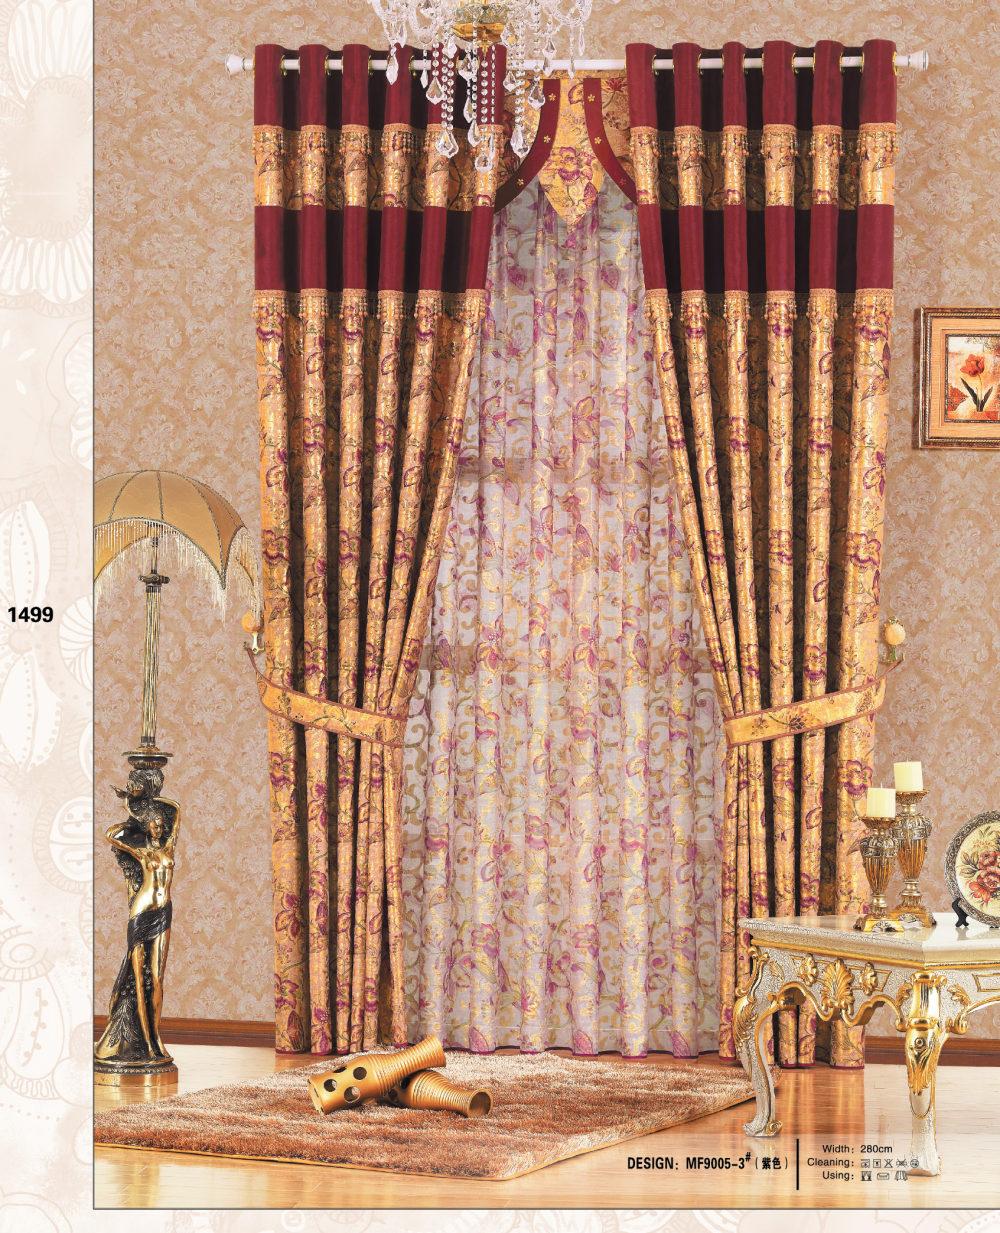 Aiden 收藏窗帘图片高清图(用方案里很清晰。)免费~_11.jpg